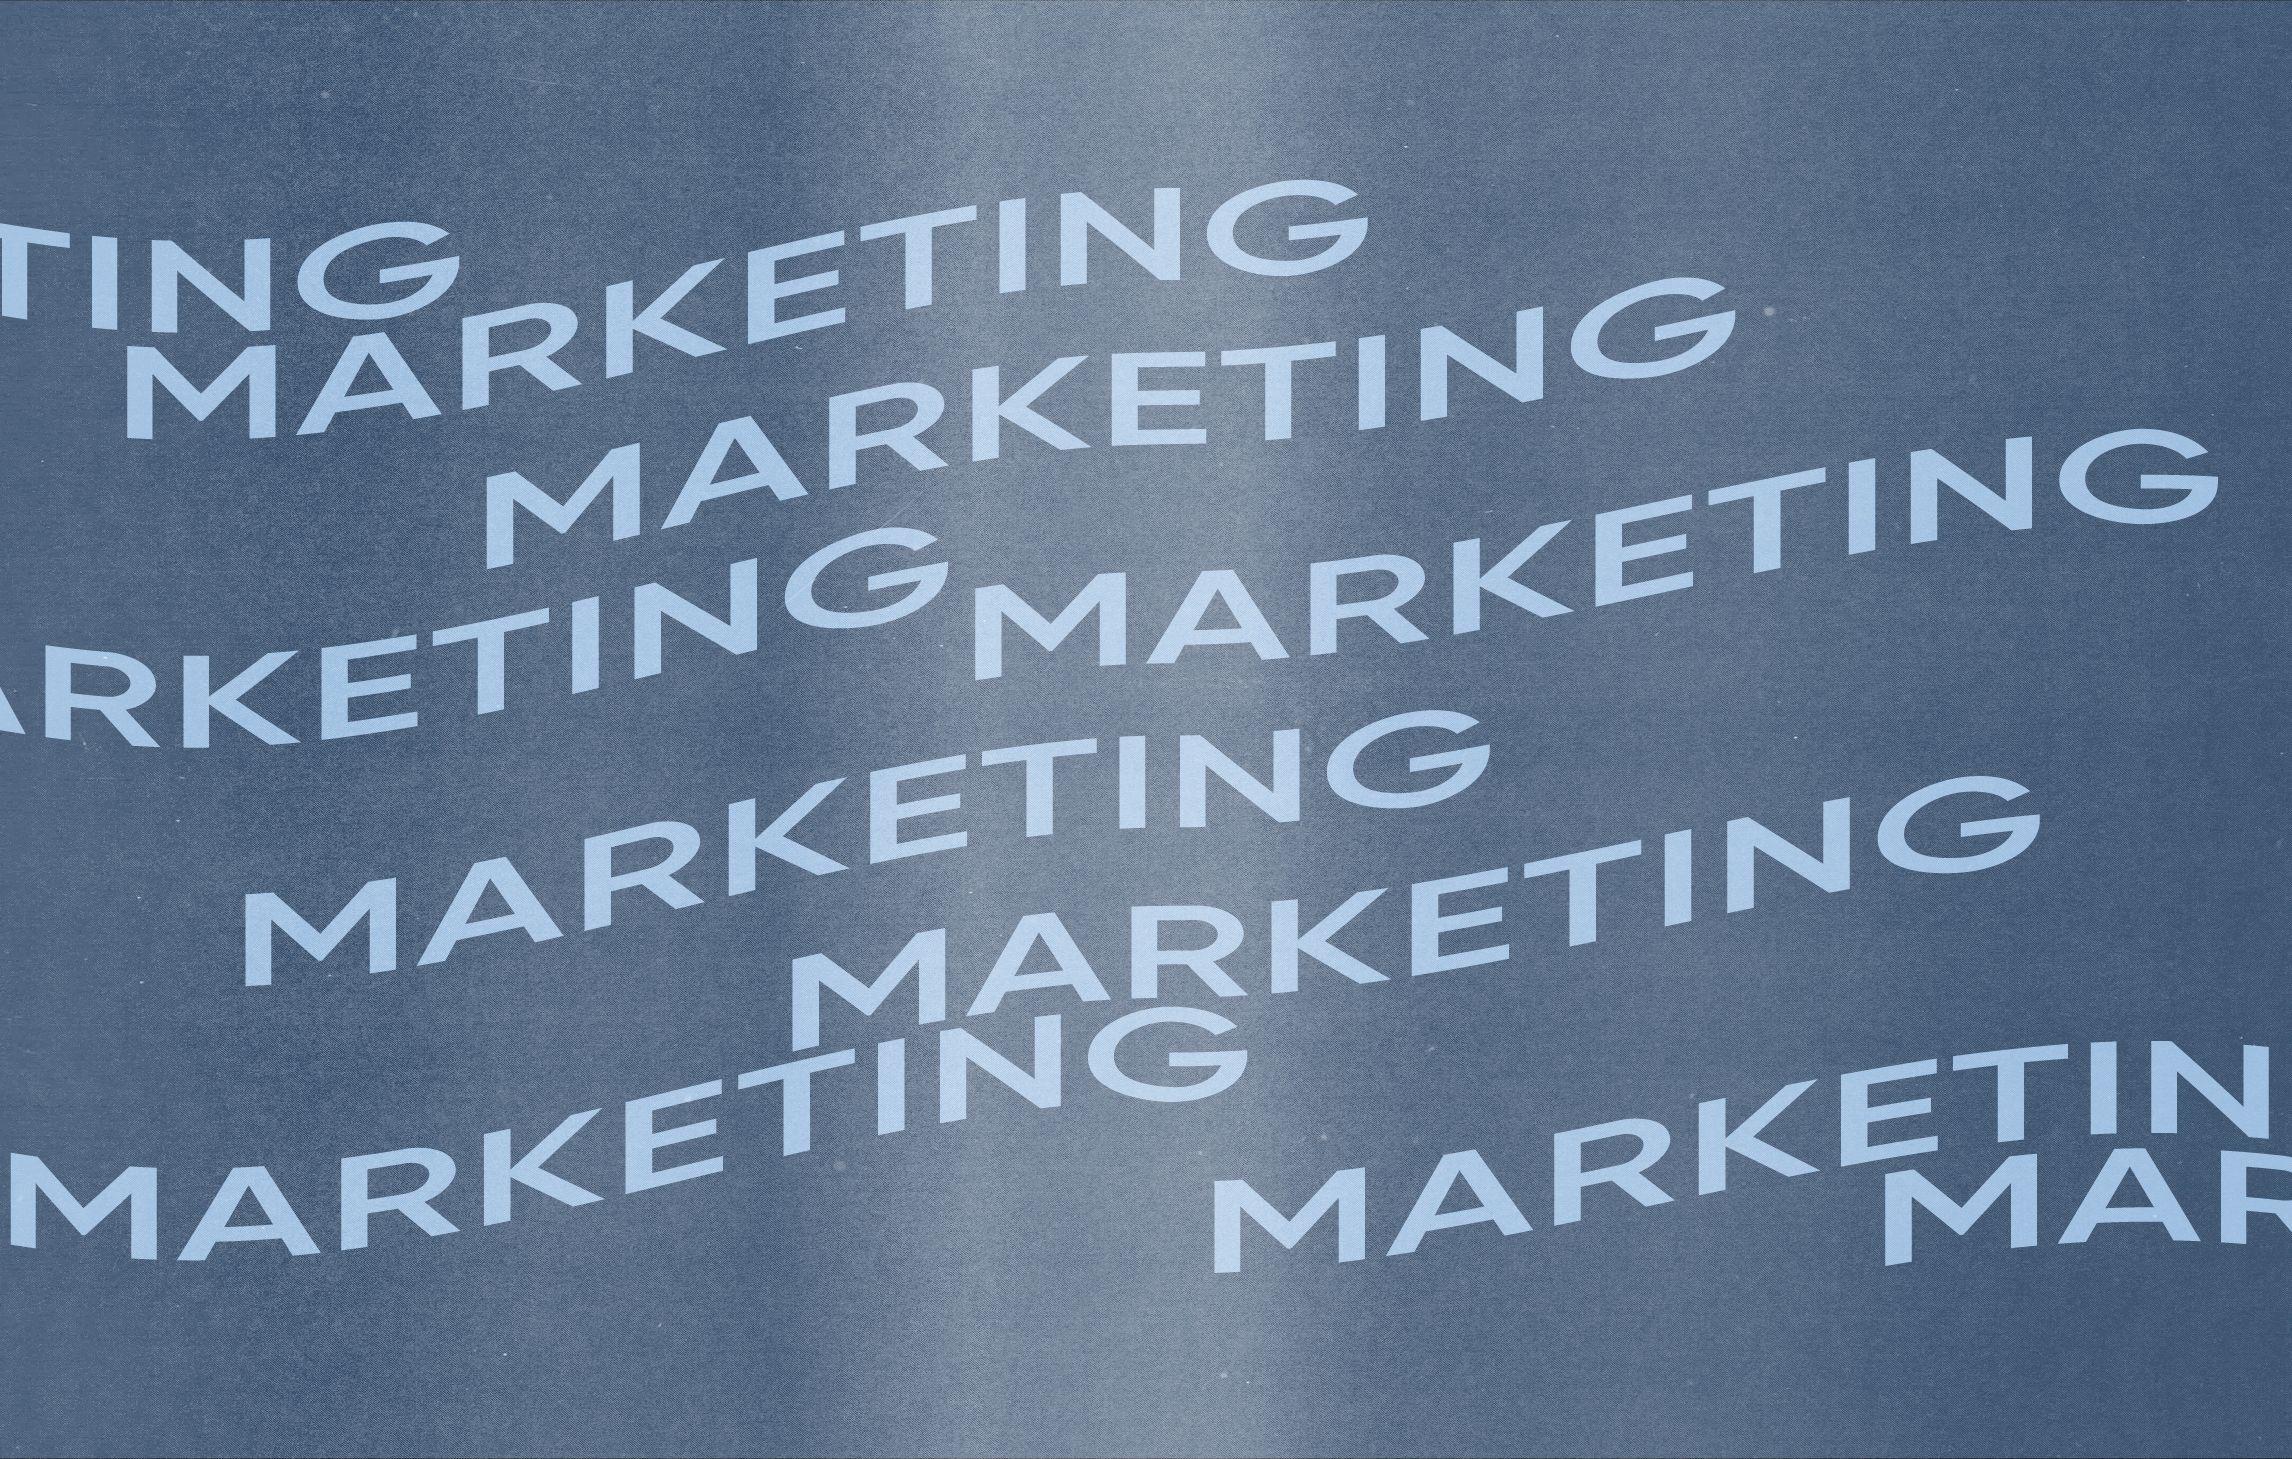 2020 Marketing Survey Options